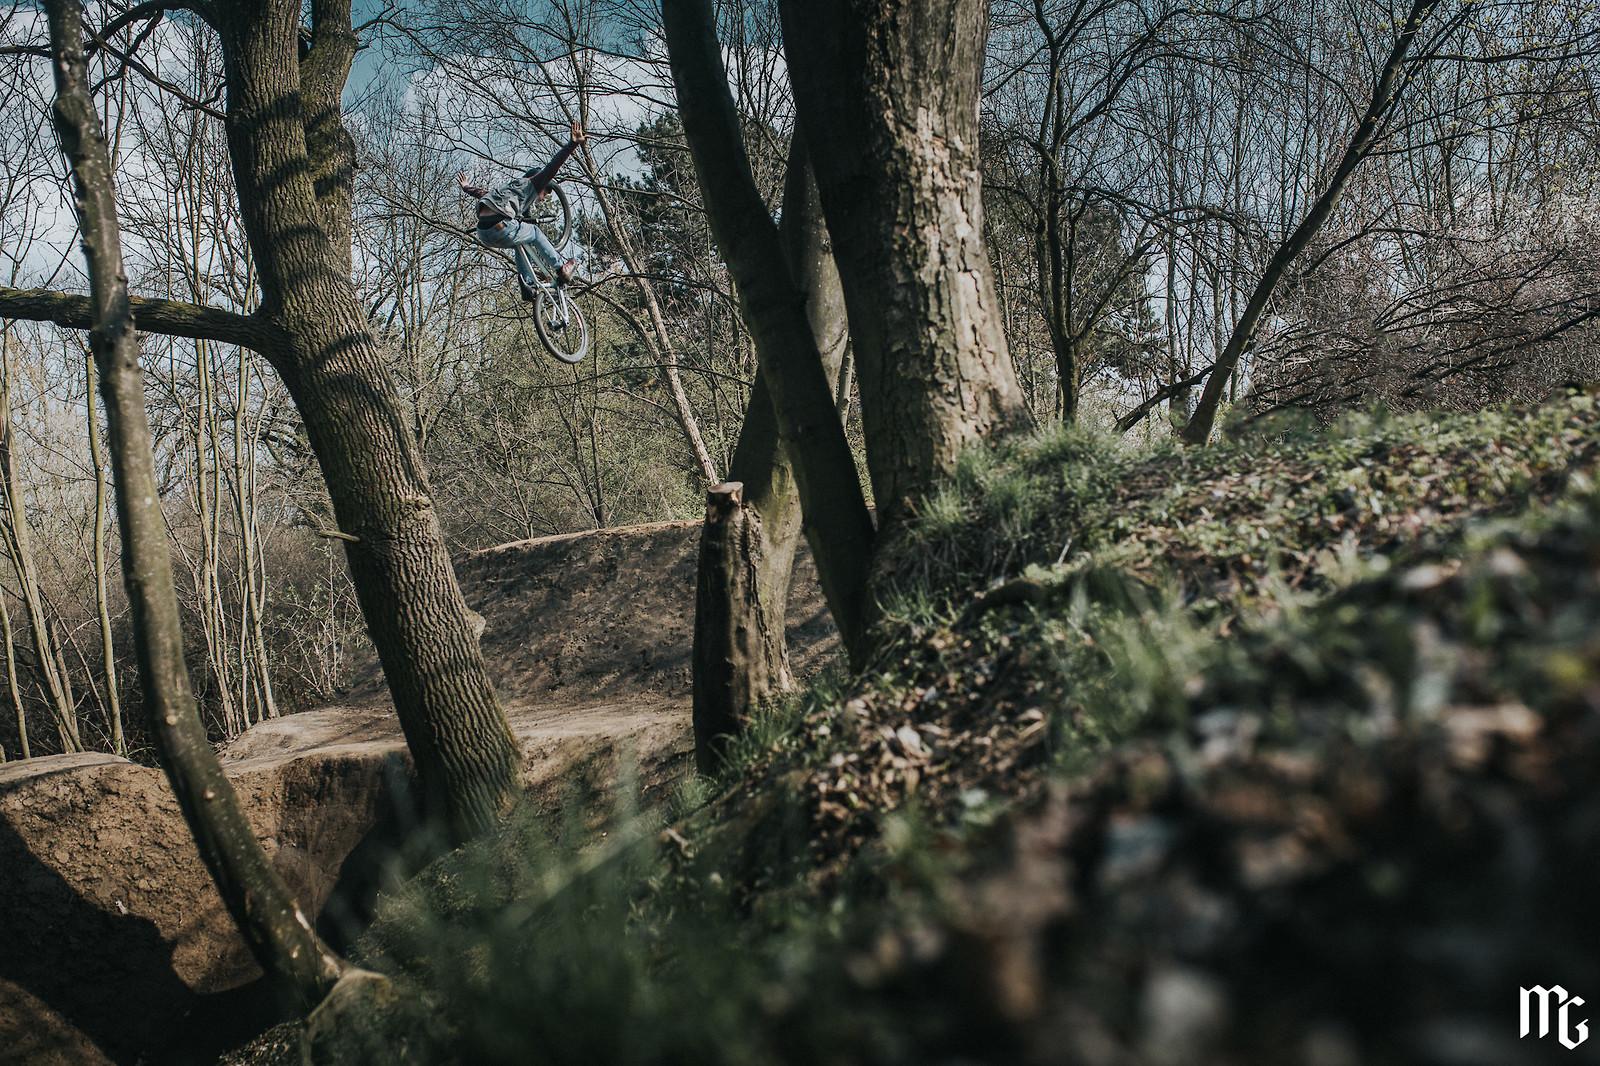 oldie on step up - Kick!Photo - Mountain Biking Pictures - Vital MTB